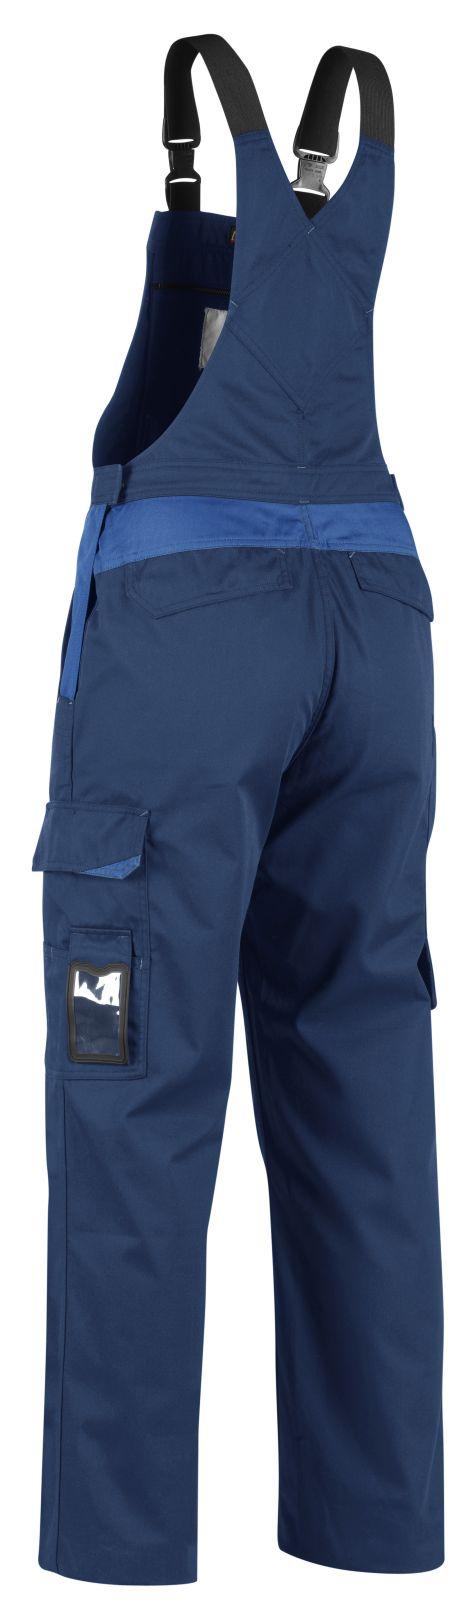 Blaklader Amerikaanse overalls 26651210 marineblauw-korenblauw(8884)